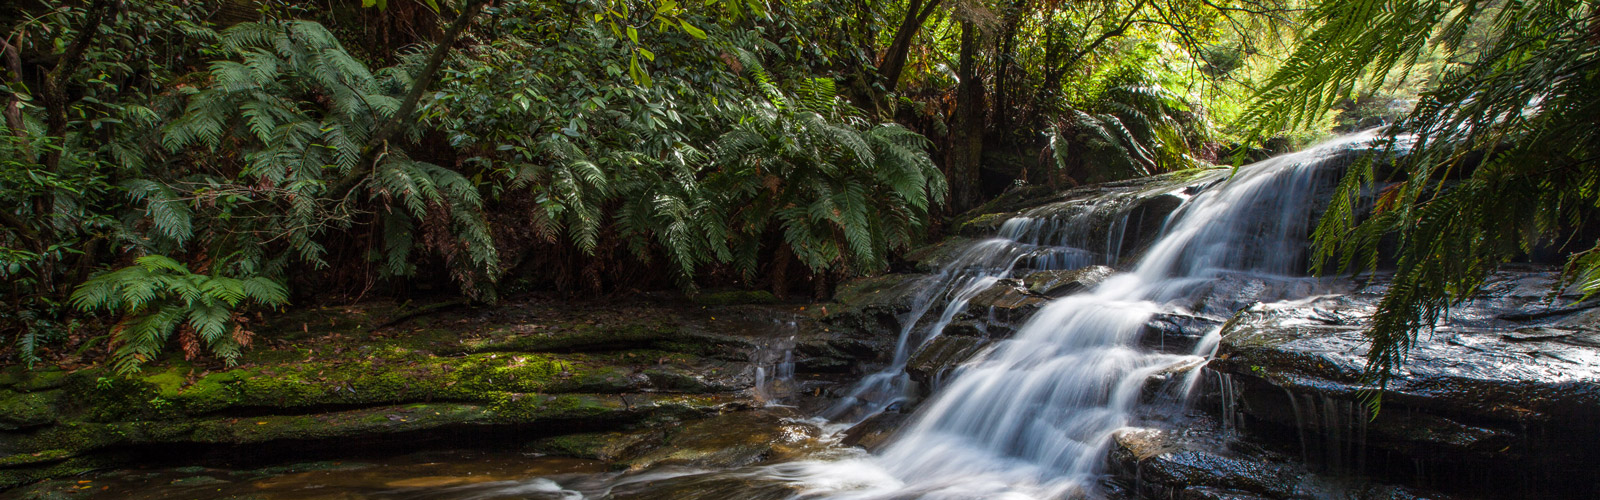 Leura, New South Wales